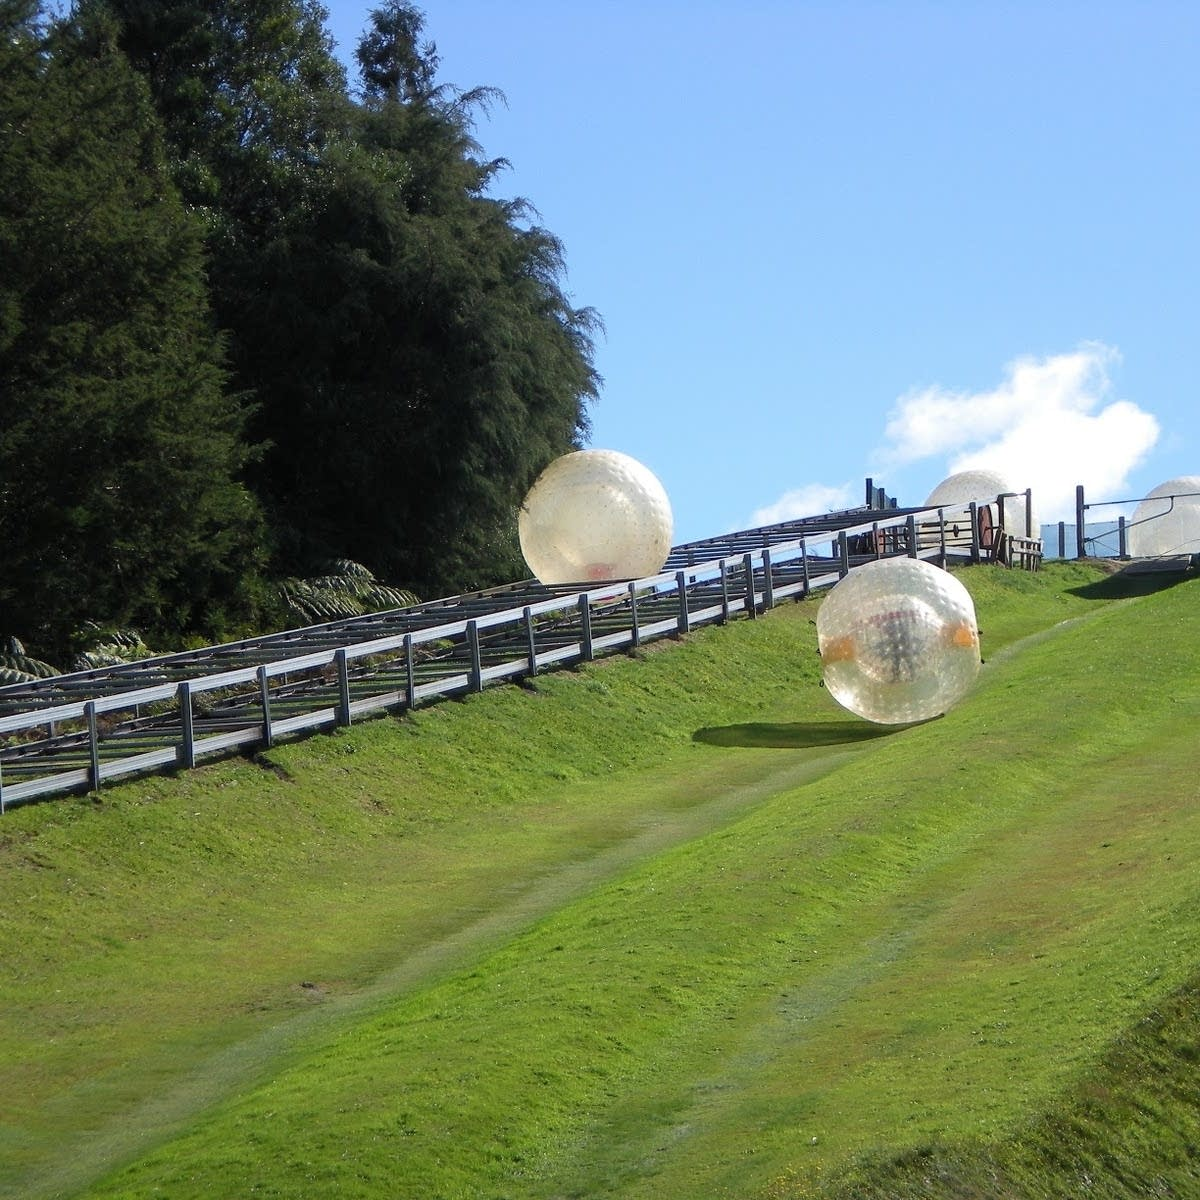 Balls rolling down hill